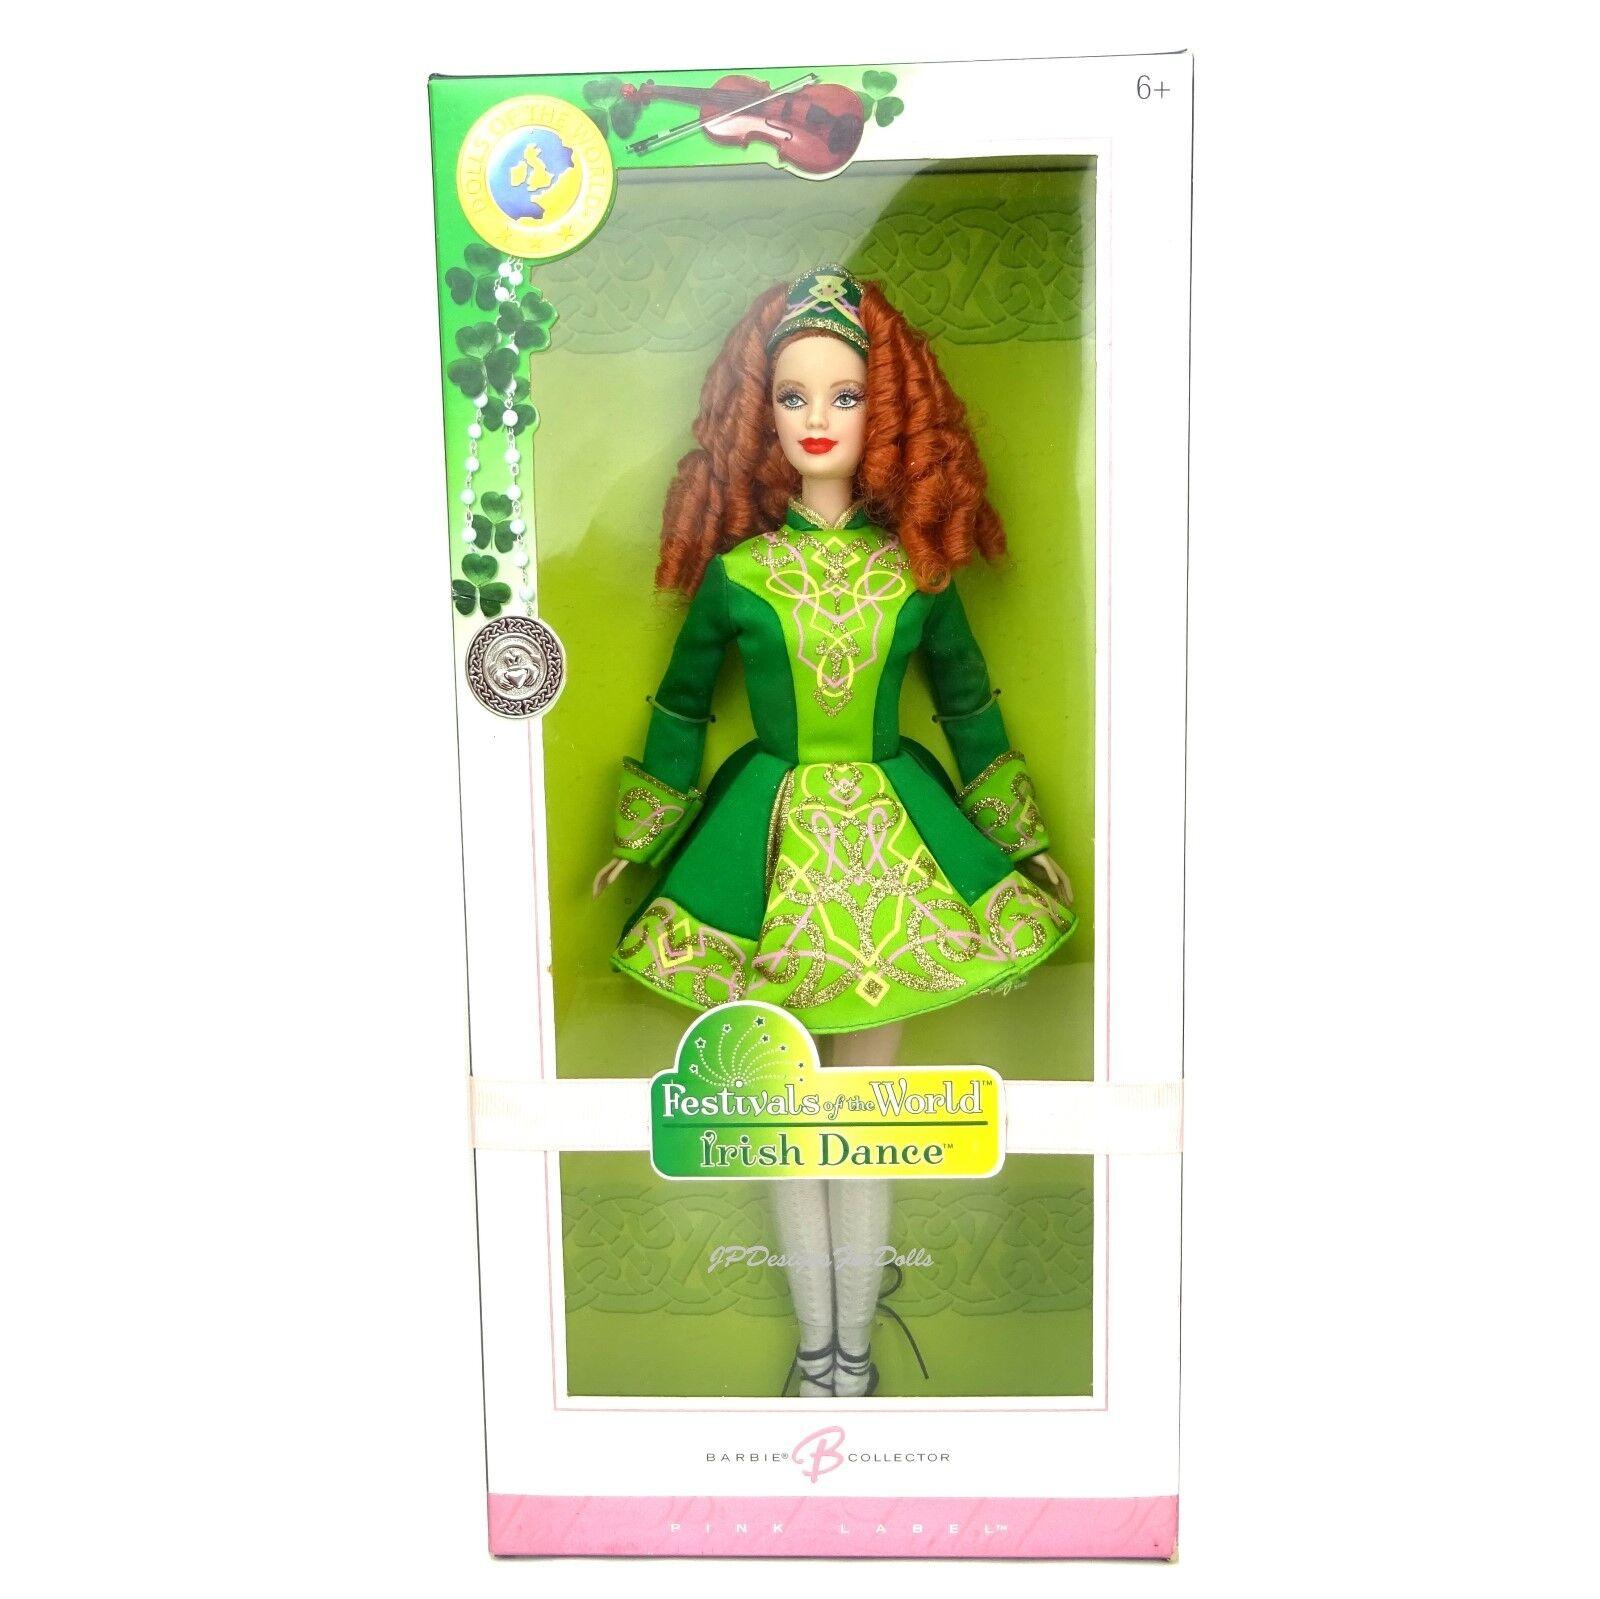 2006 Barbie Festival of the World Irish Dance Dance Dance Barbie Doll Rosa Label Worn Box 629a42